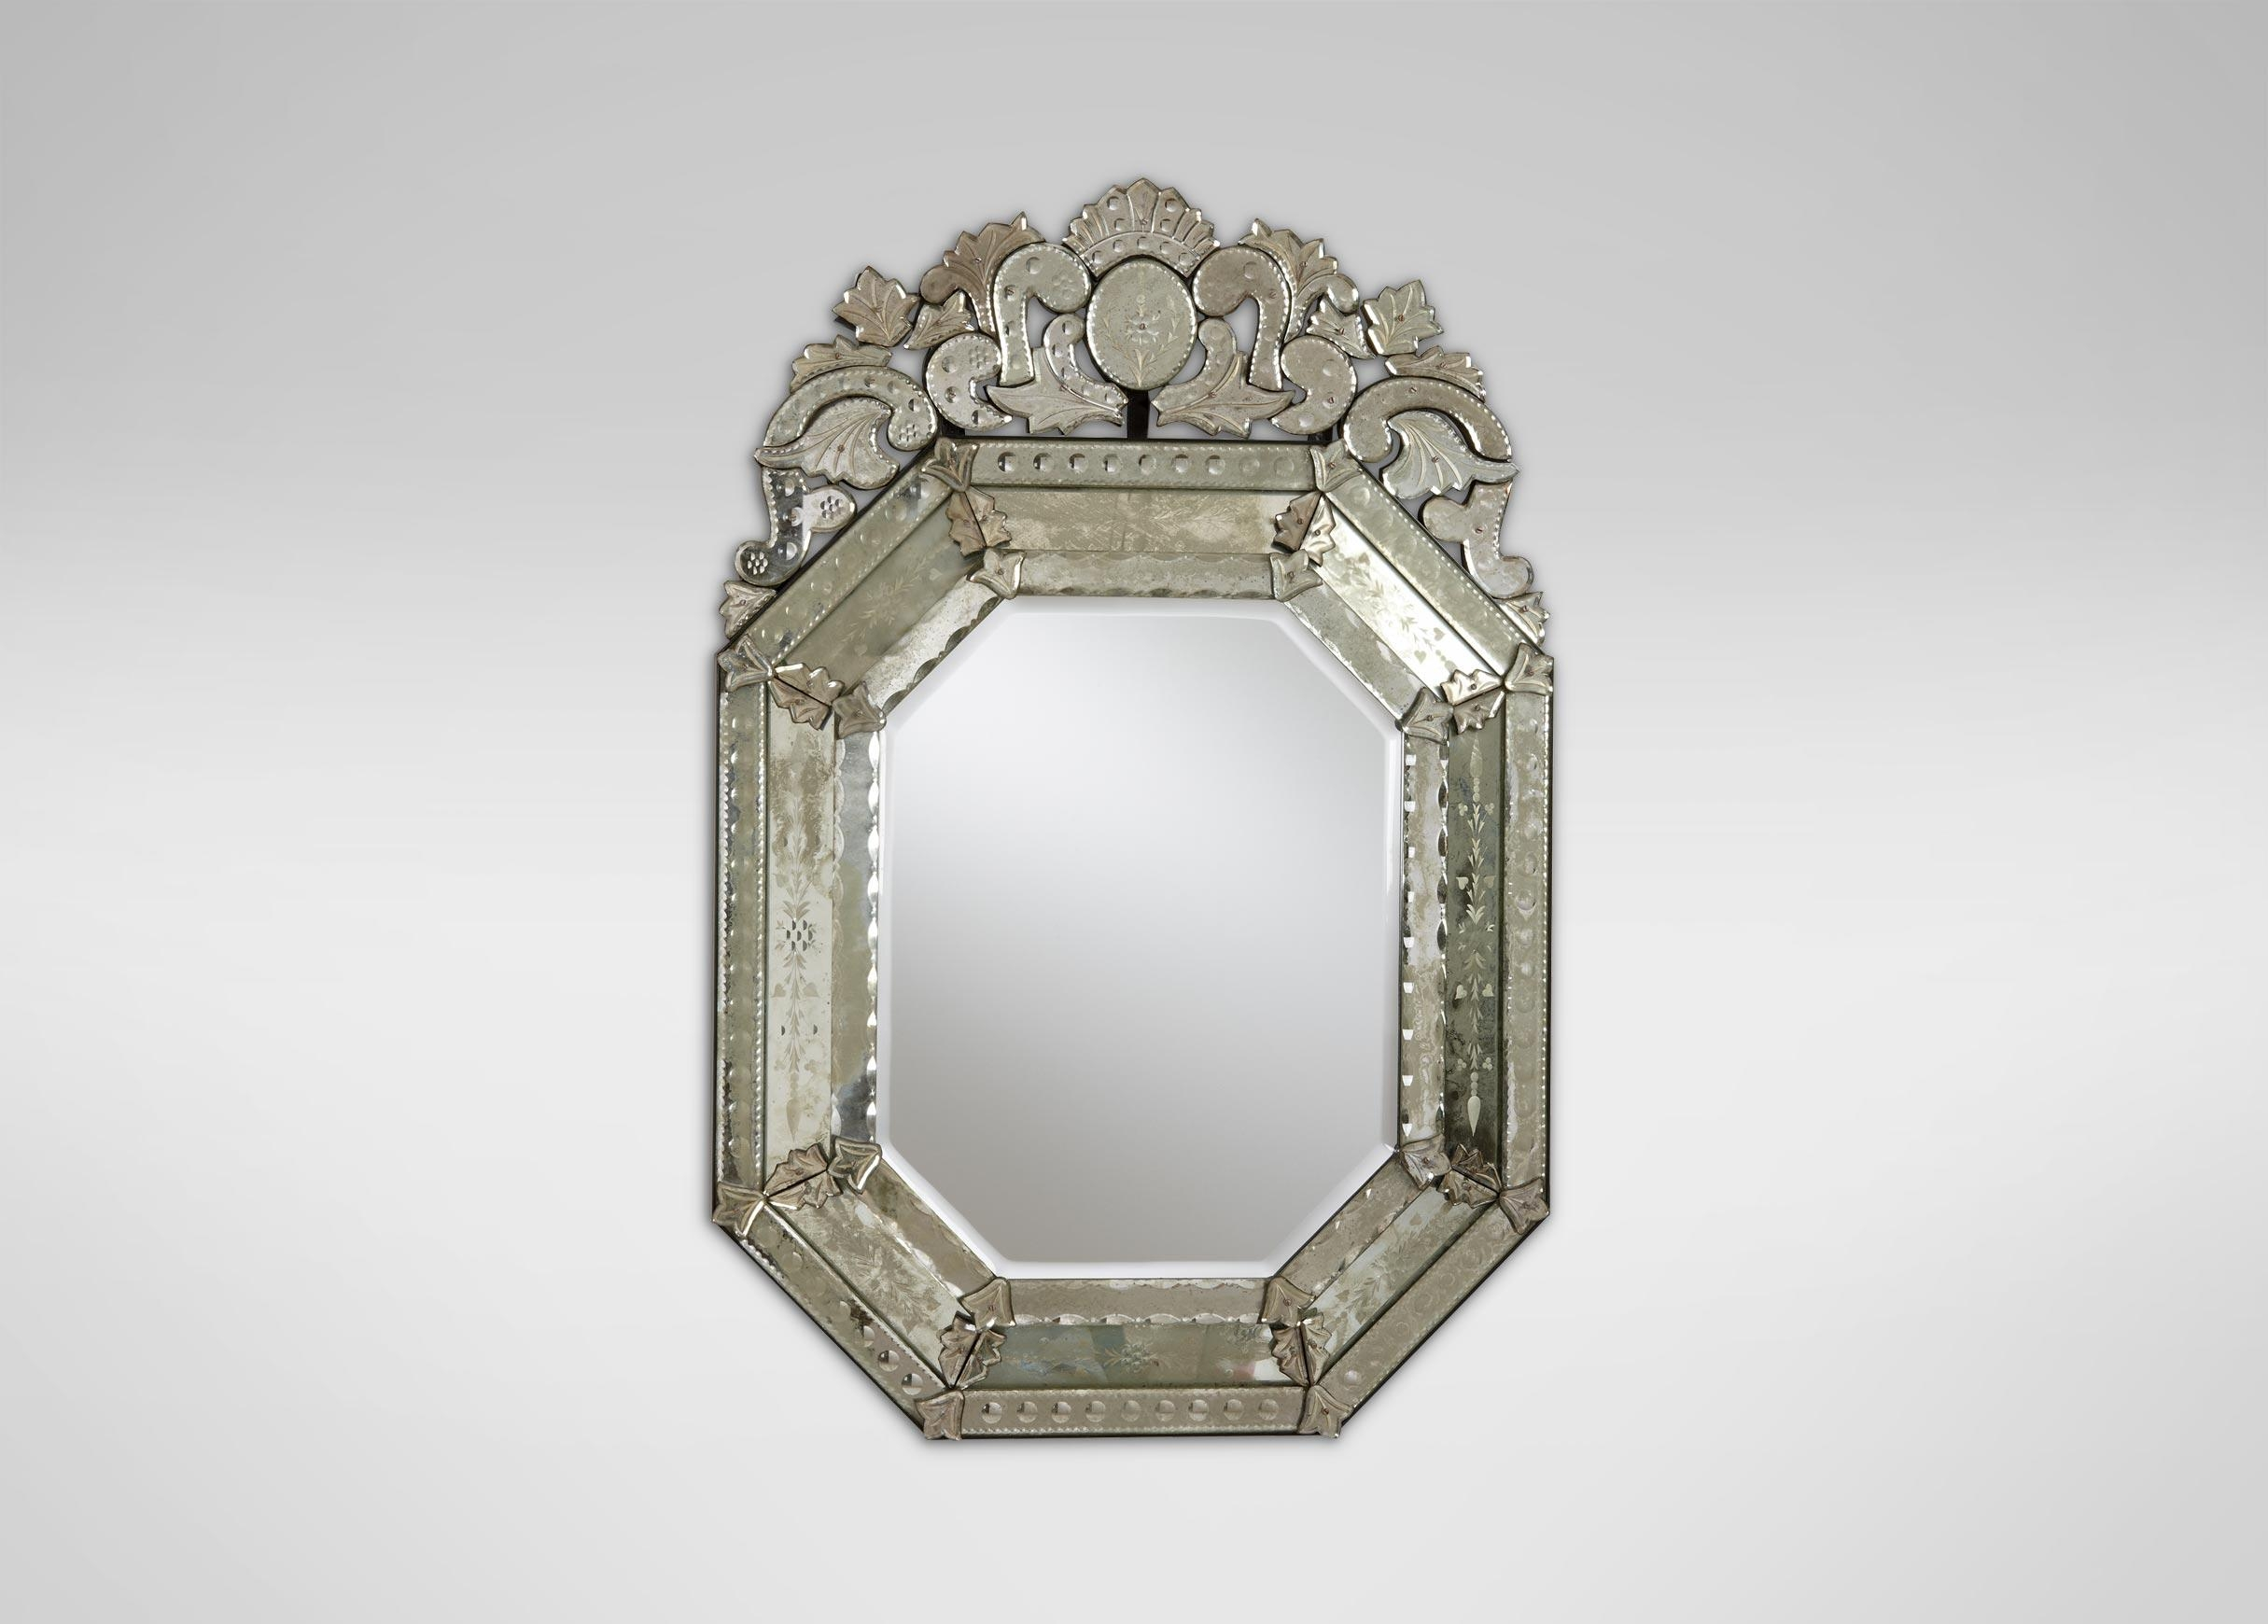 Ethan Allen Venetian Mirror 07 4055 – Classical Addiction Beaux For Small Venetian Mirror (View 2 of 20)